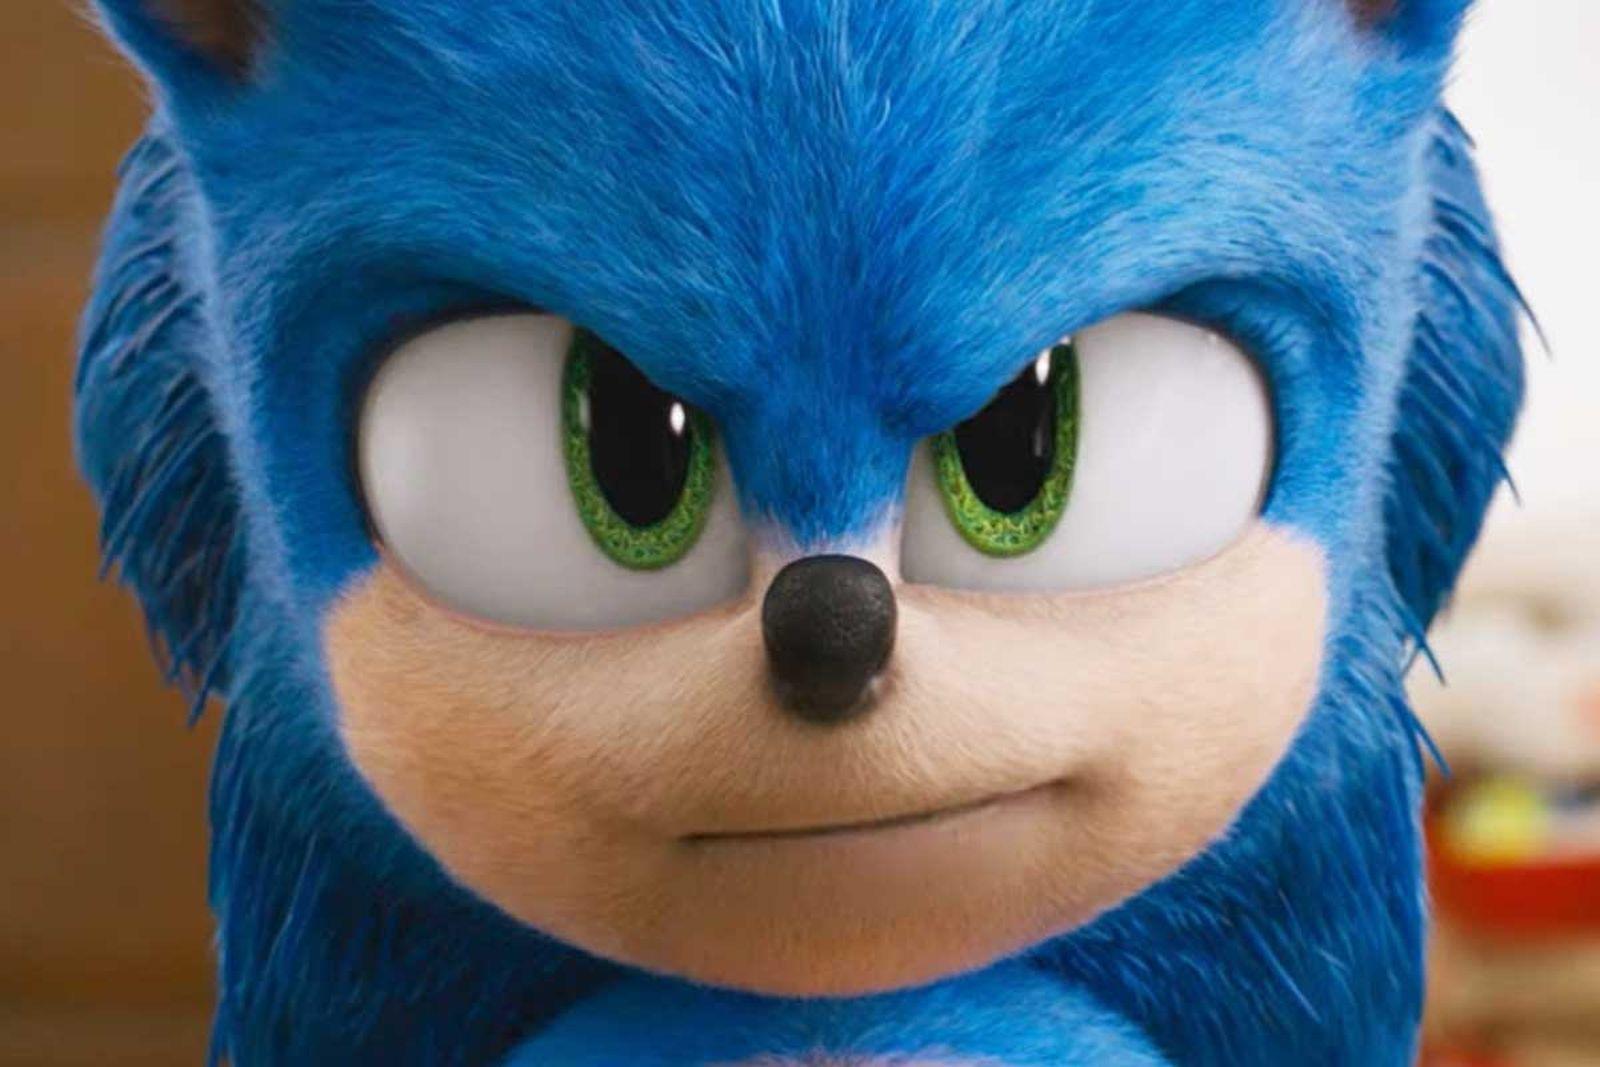 'Sonic The Hedgehog' Reviews